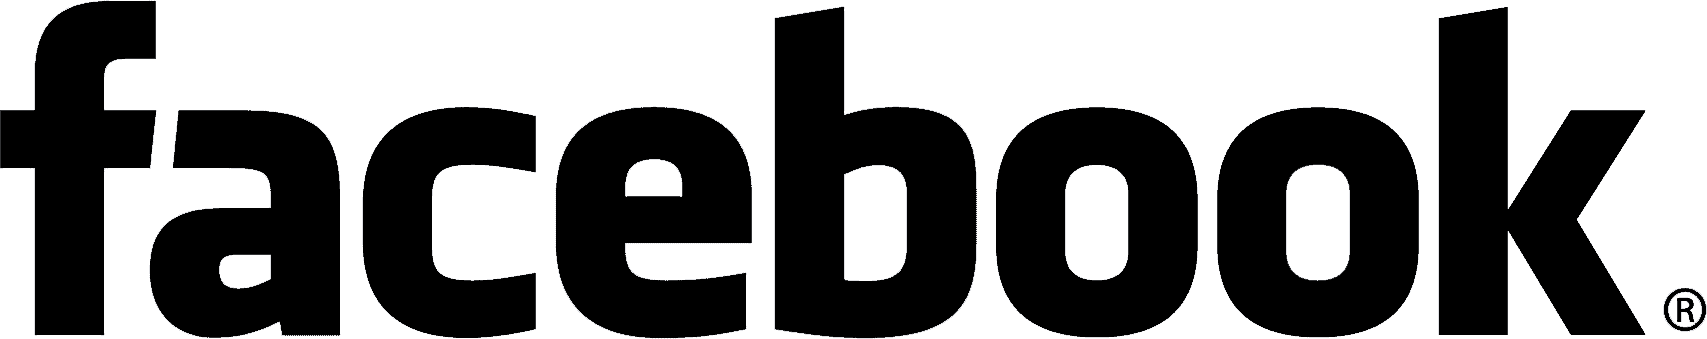 FaceBook Logo Gunnar Soardel